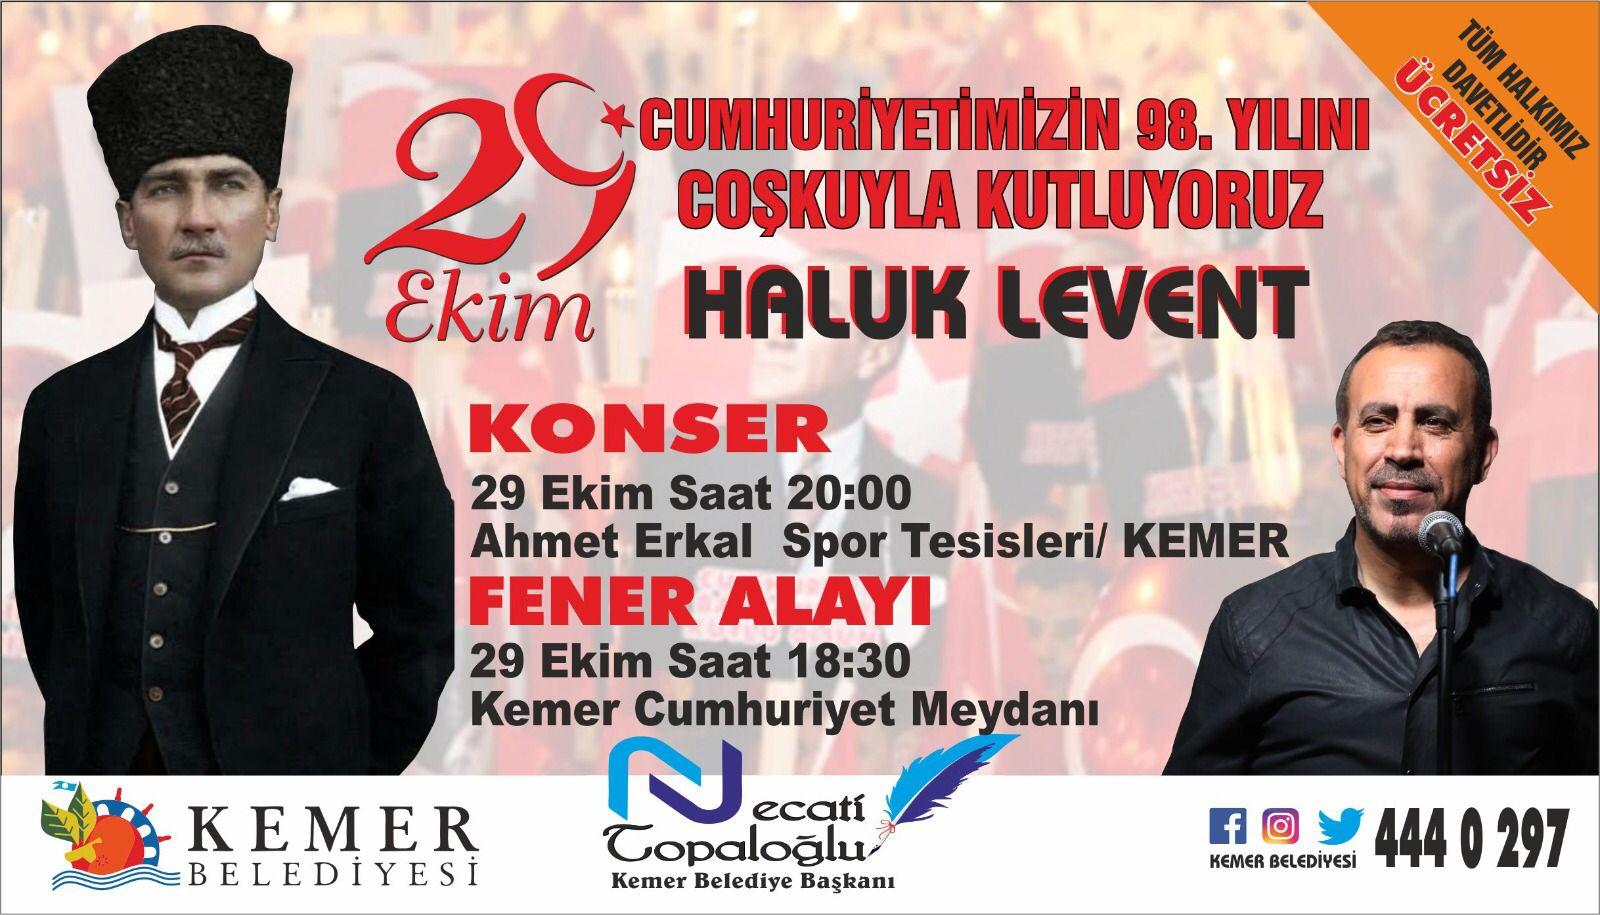 HALUK LEVENT KONSERİ